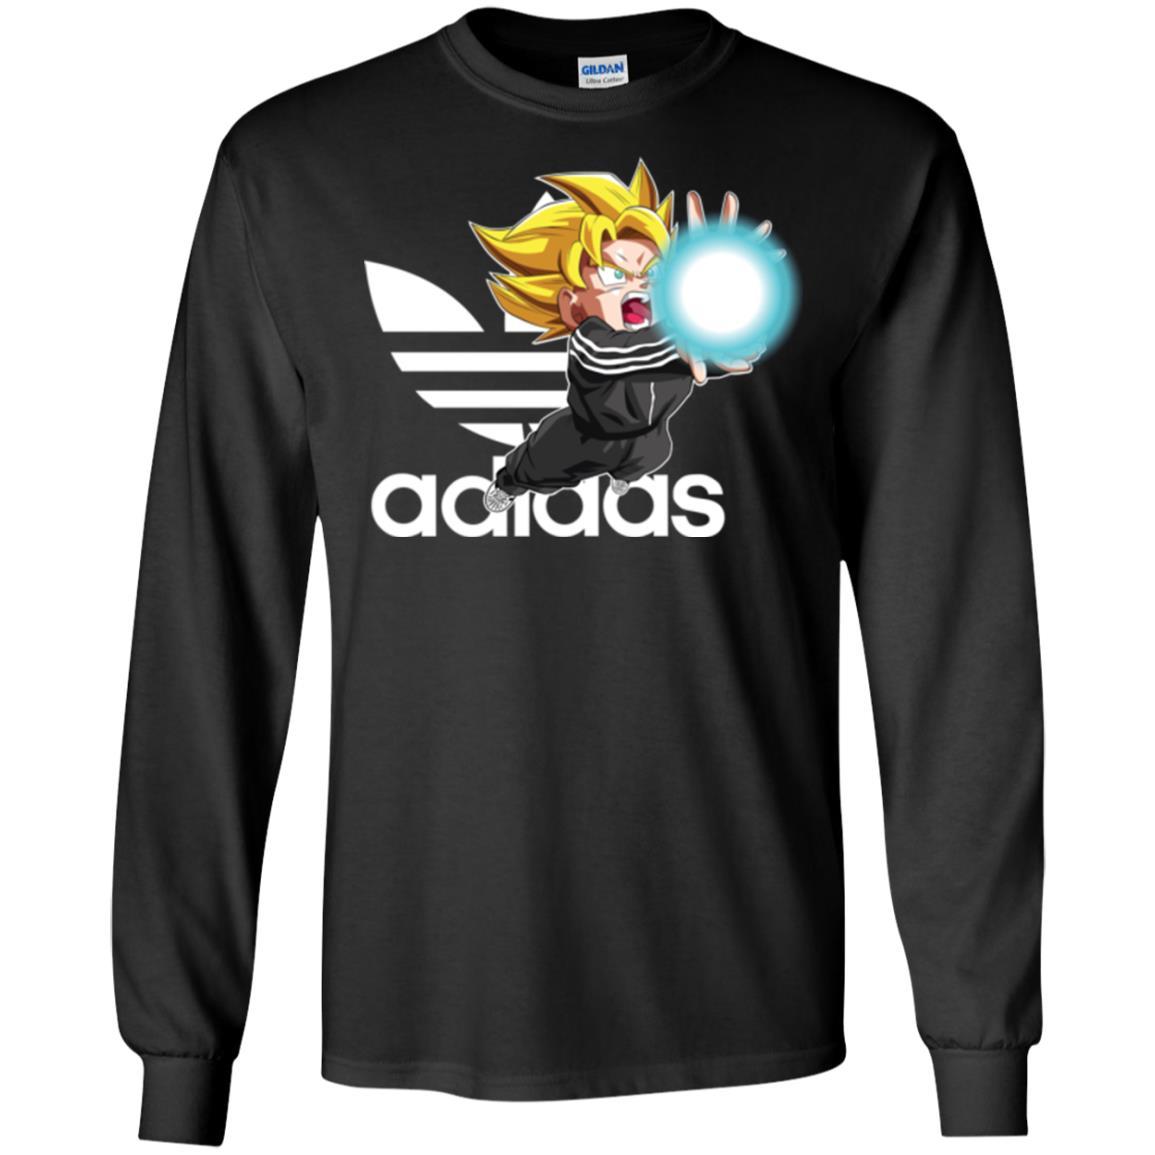 image 264px Goku Adidas Mashup T Shirt, Hoodies, Tank Top Available